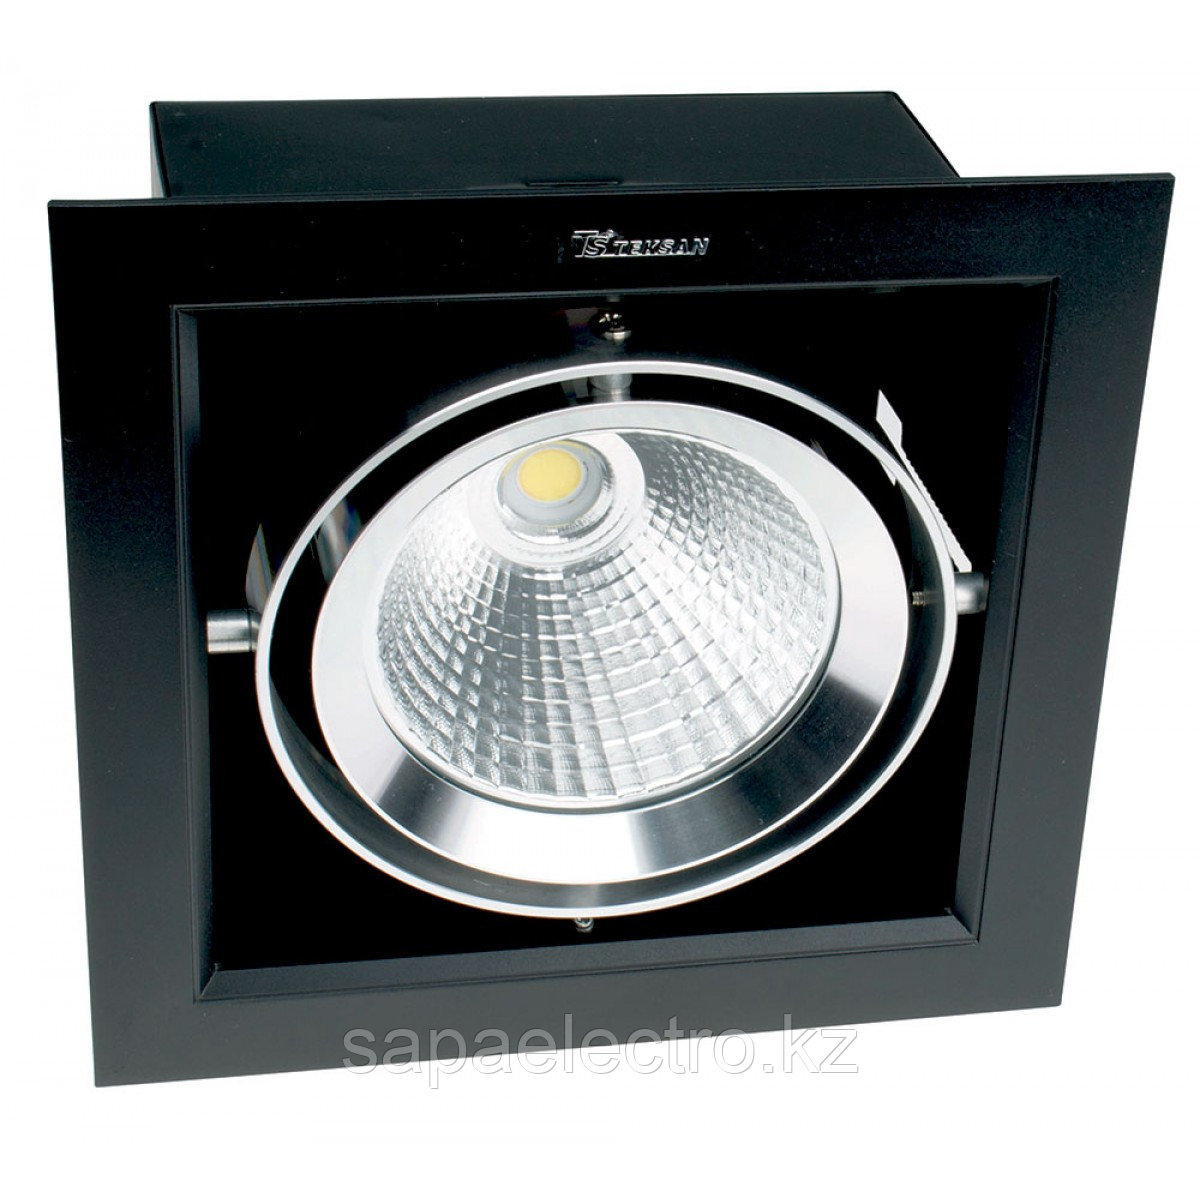 Свет-к DOWNLIGHT LED RS-2108C-1 20W 5700K (TS)12шт